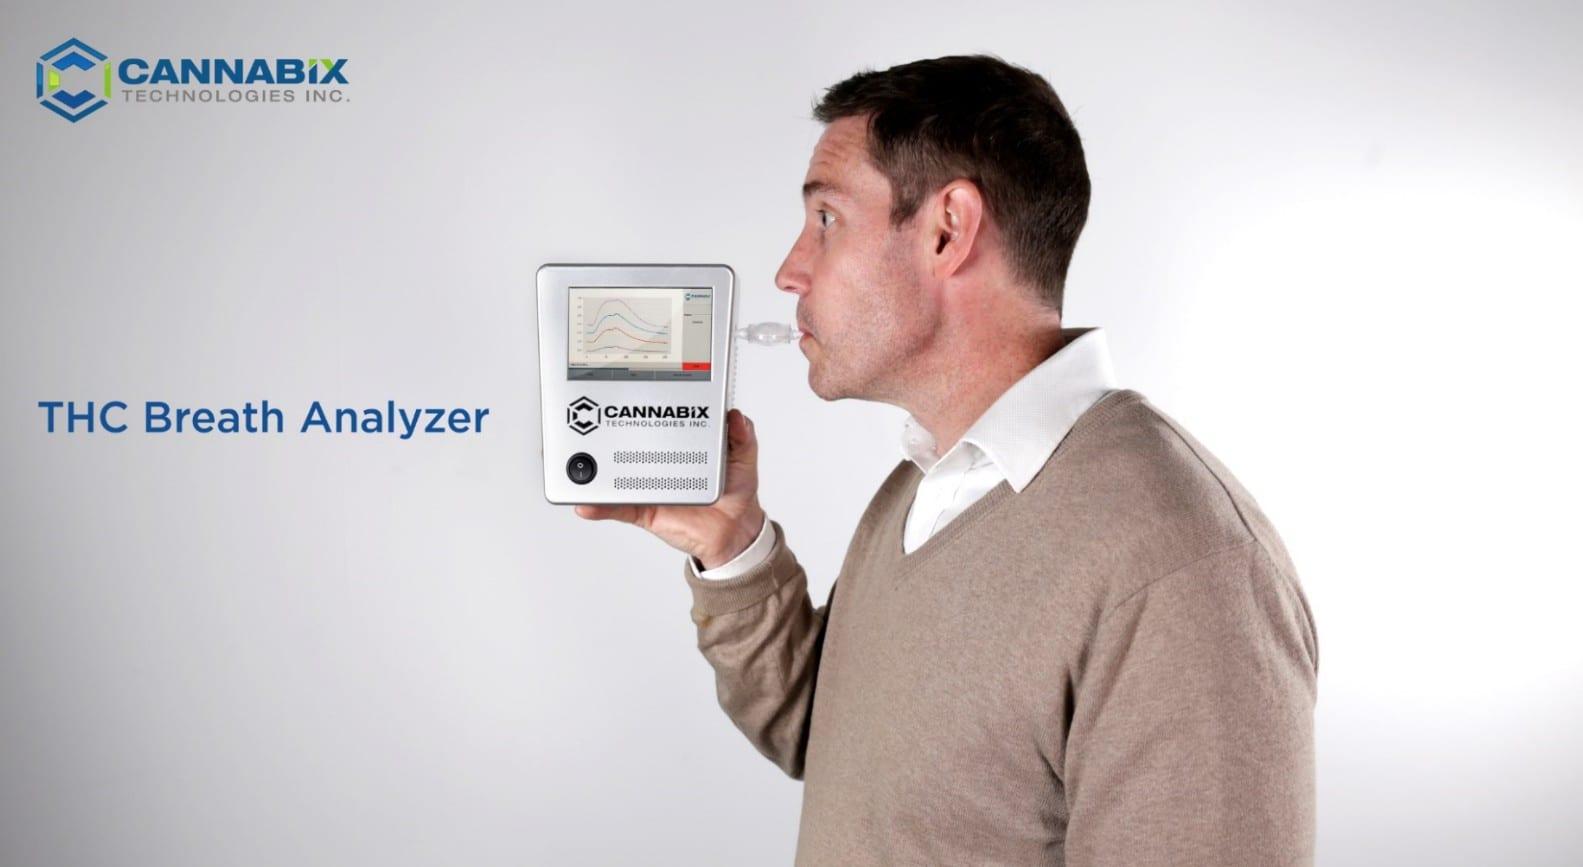 Cannabix announces new THC breathalyzer milestone, DUI lawyer skeptical